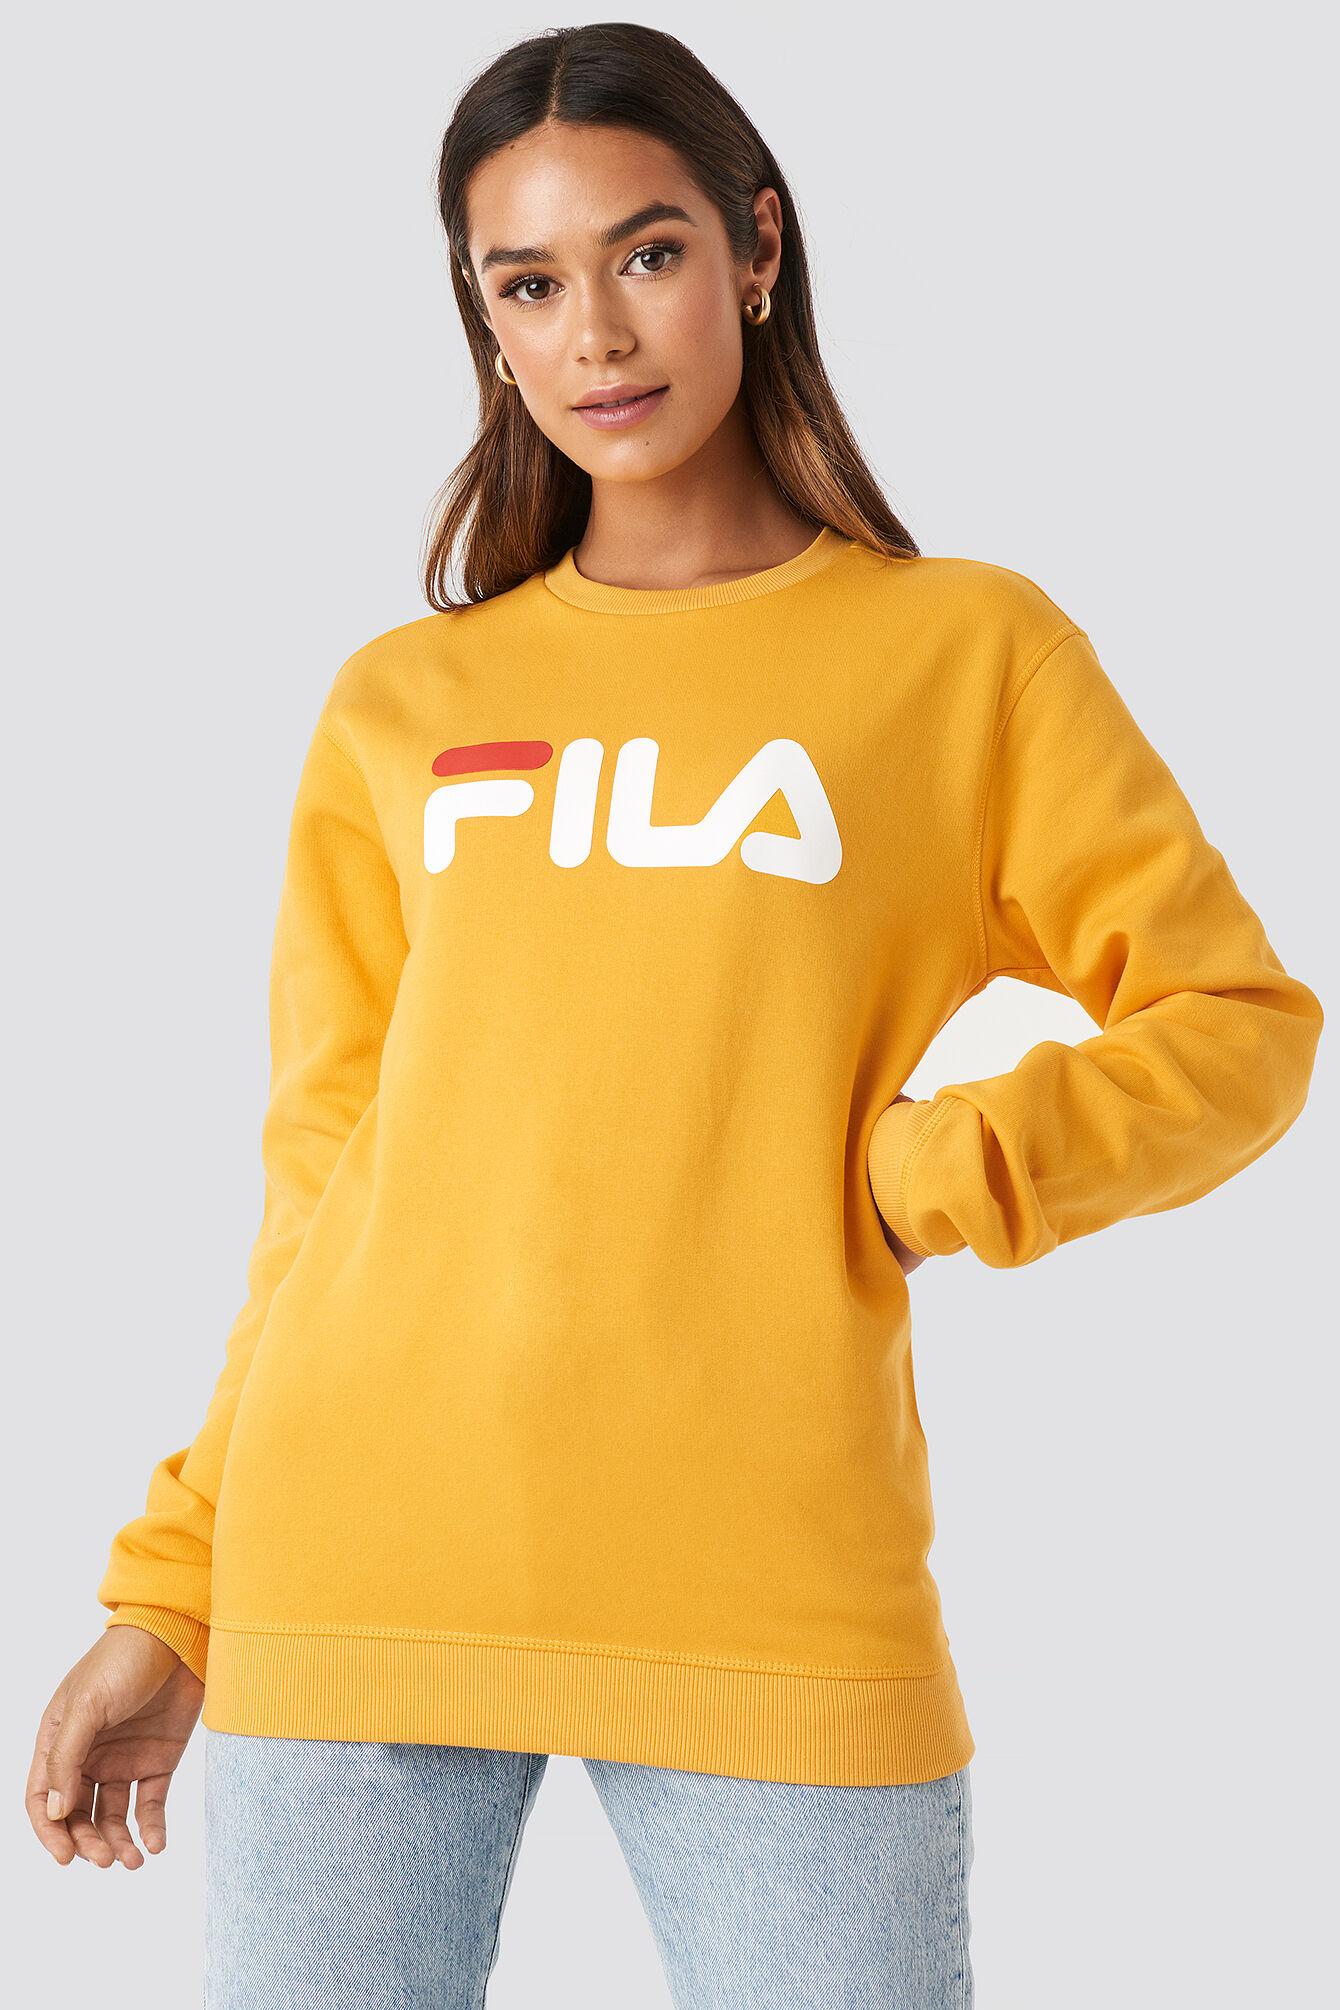 FILA Classic Pure Crew Sweat - Yellow  - Size: Small